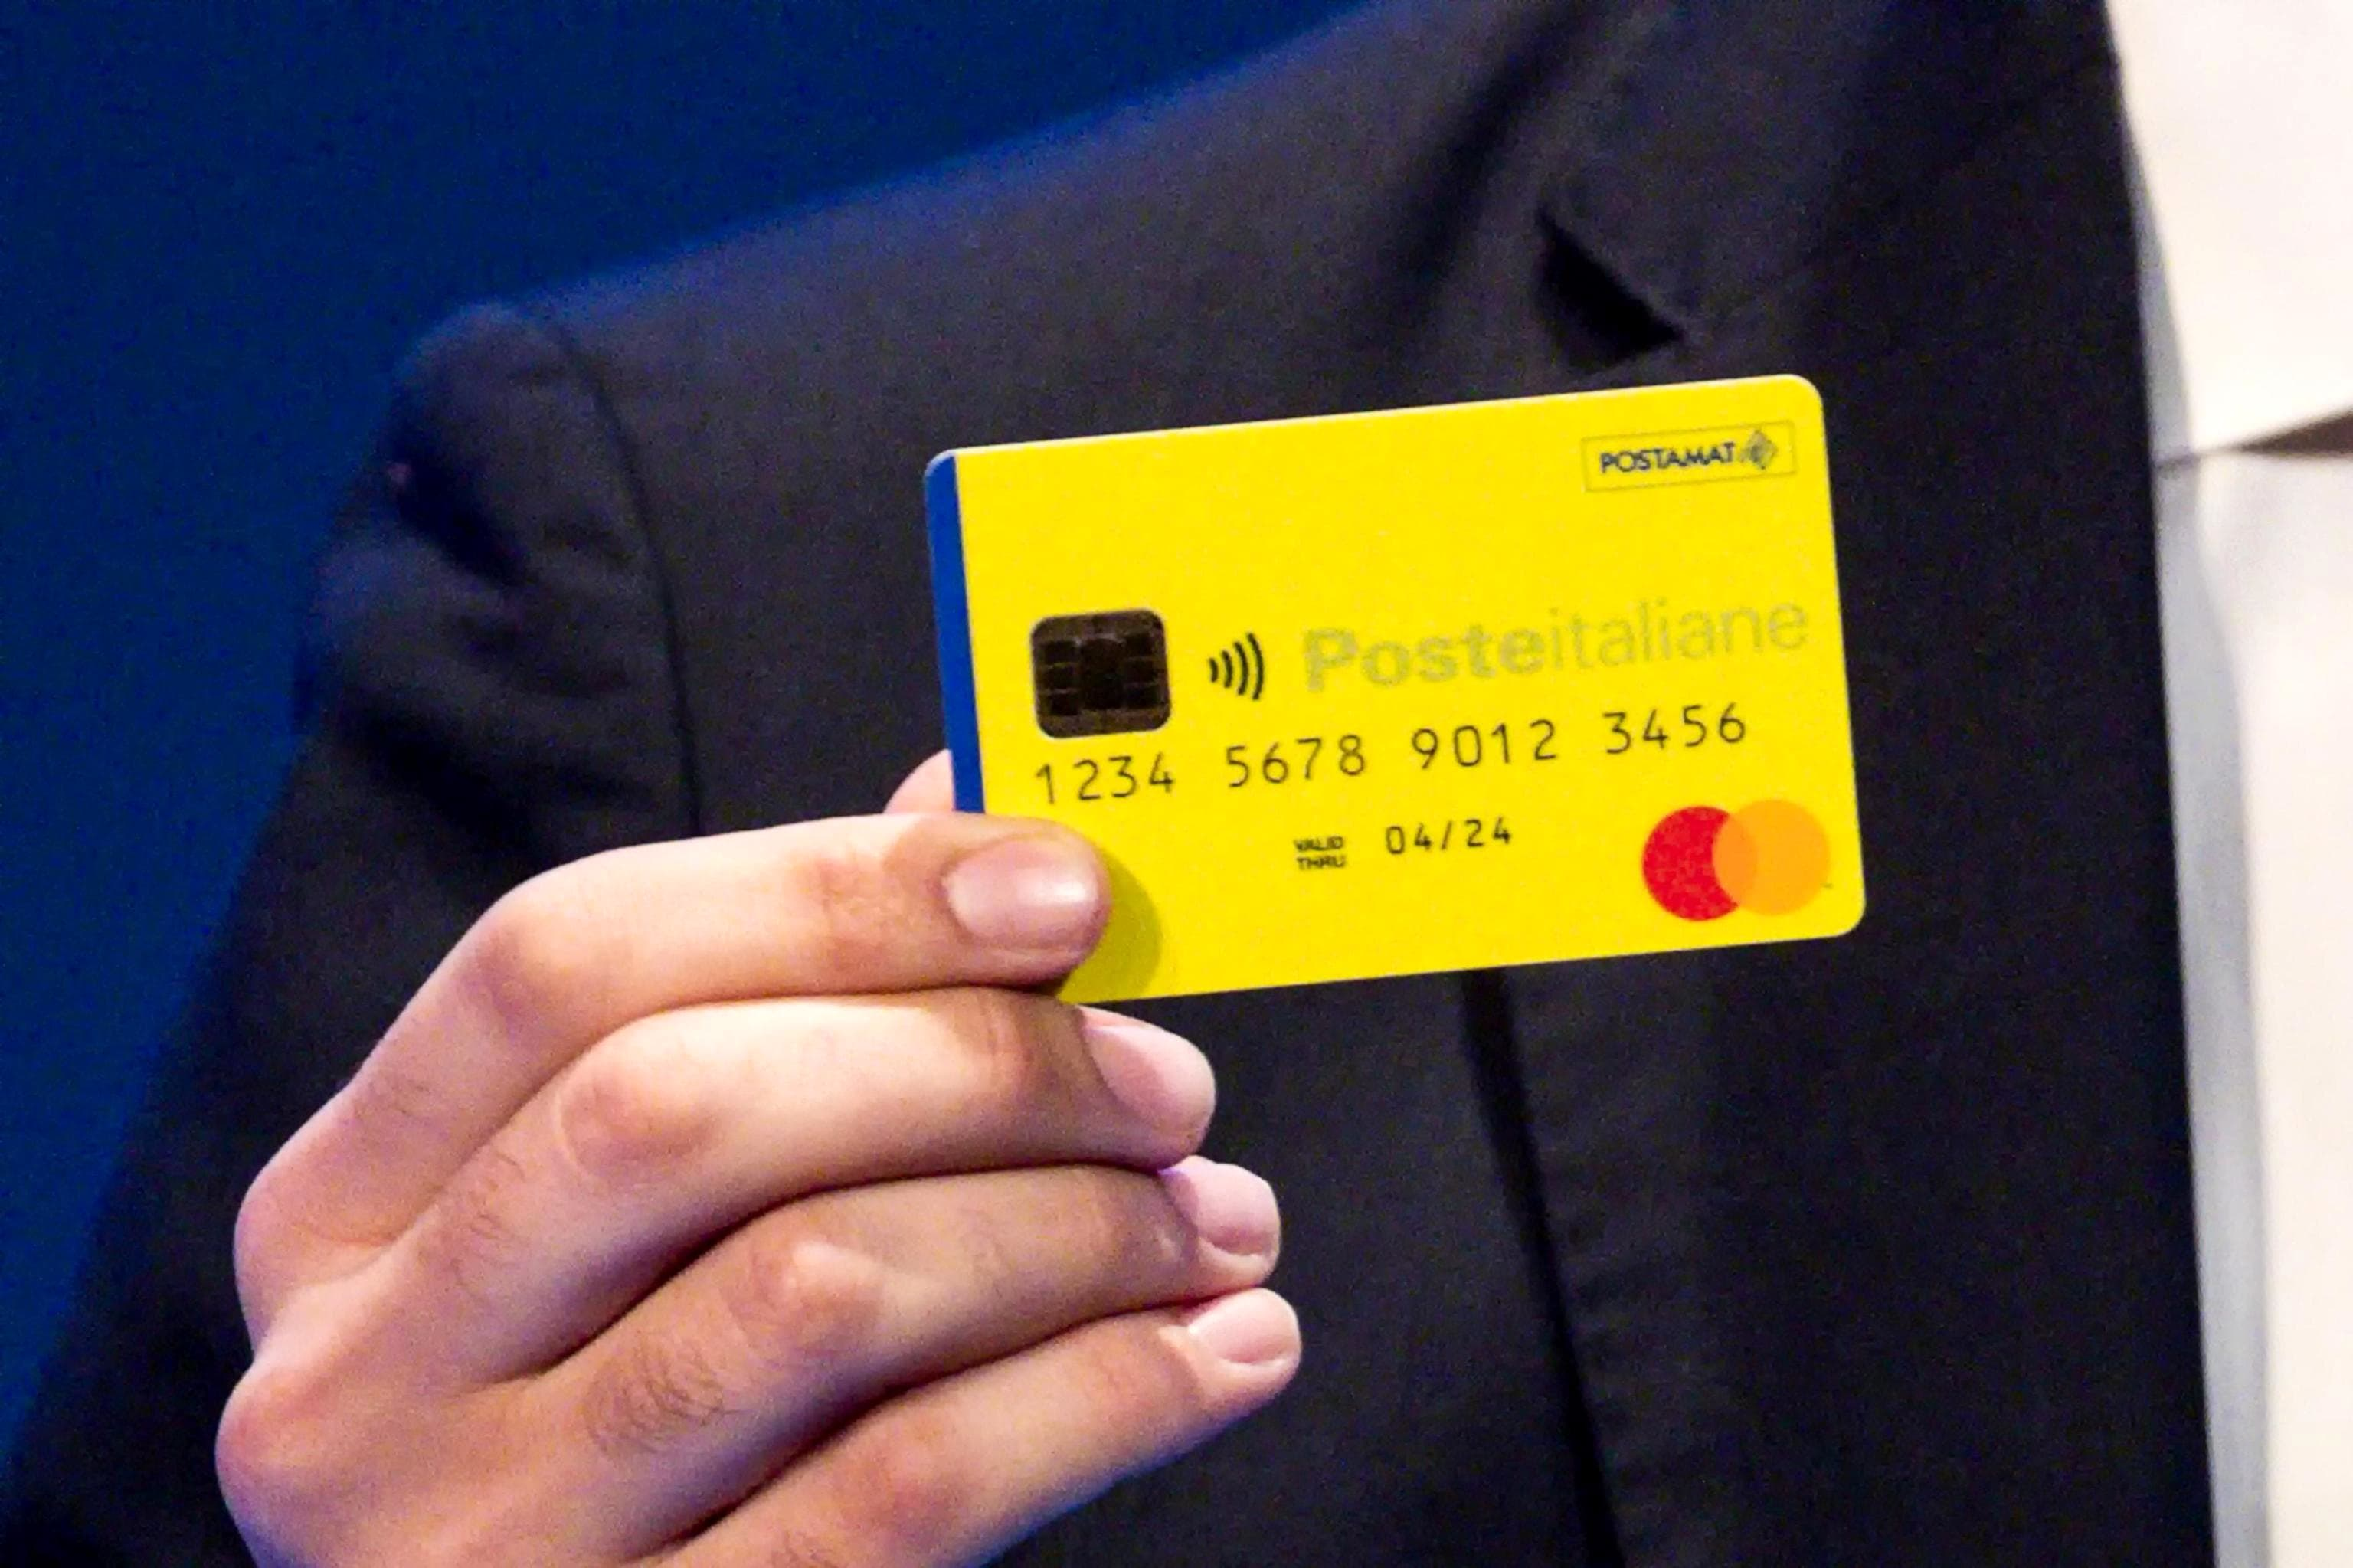 reddito cittadinanza card ansa-2